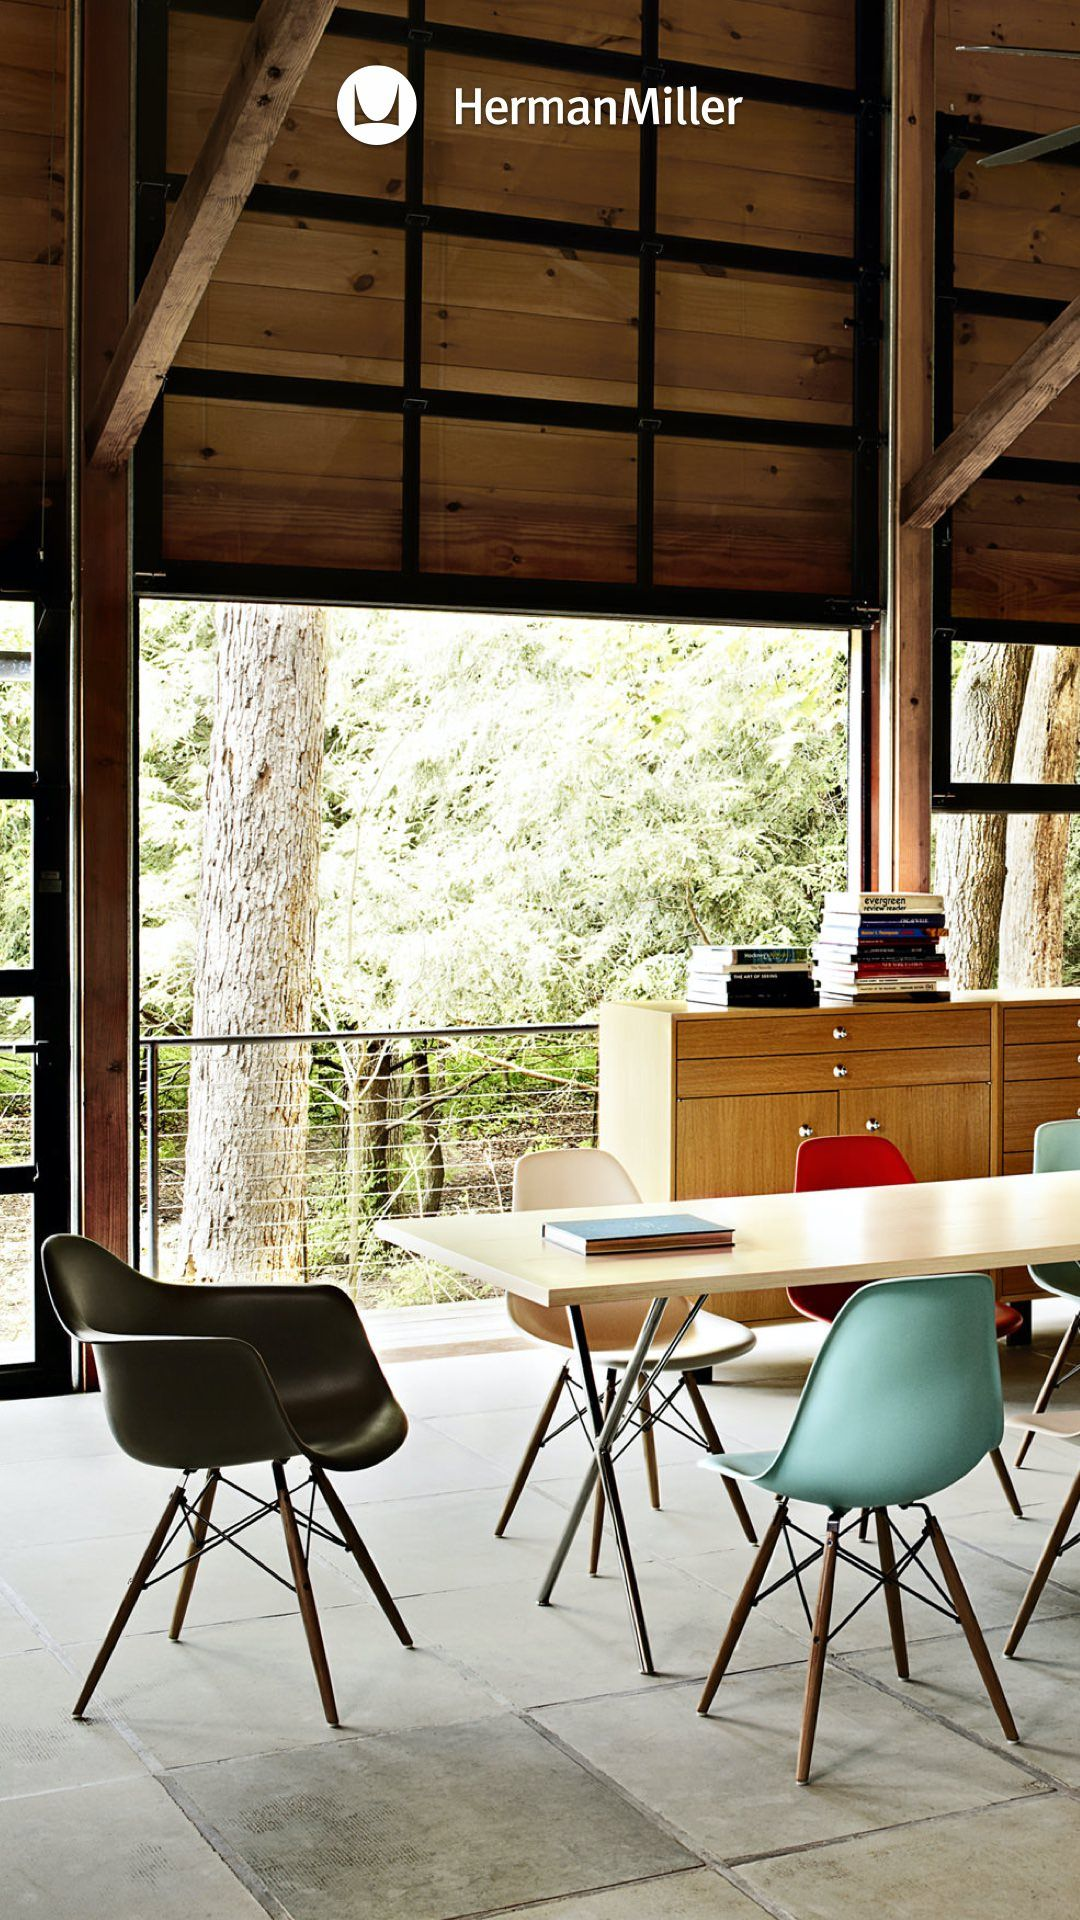 Eames Chair Dining Room, Herman Miller Dining Room Set